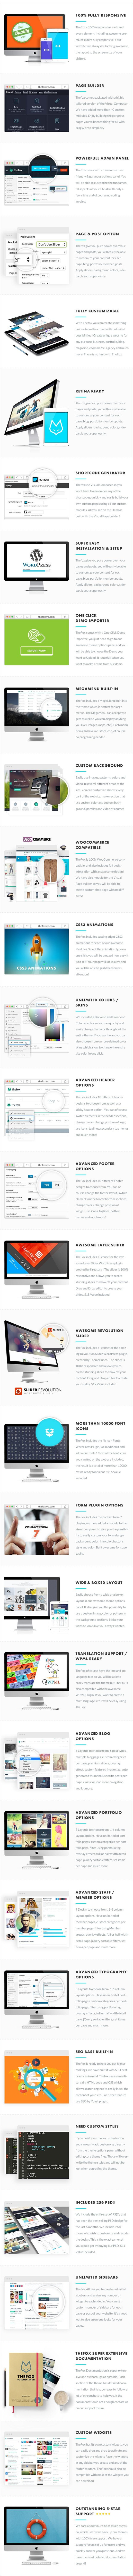 04 TheFox Core Powerful Features - TheFox   Responsive Multi-Purpose WordPress Theme